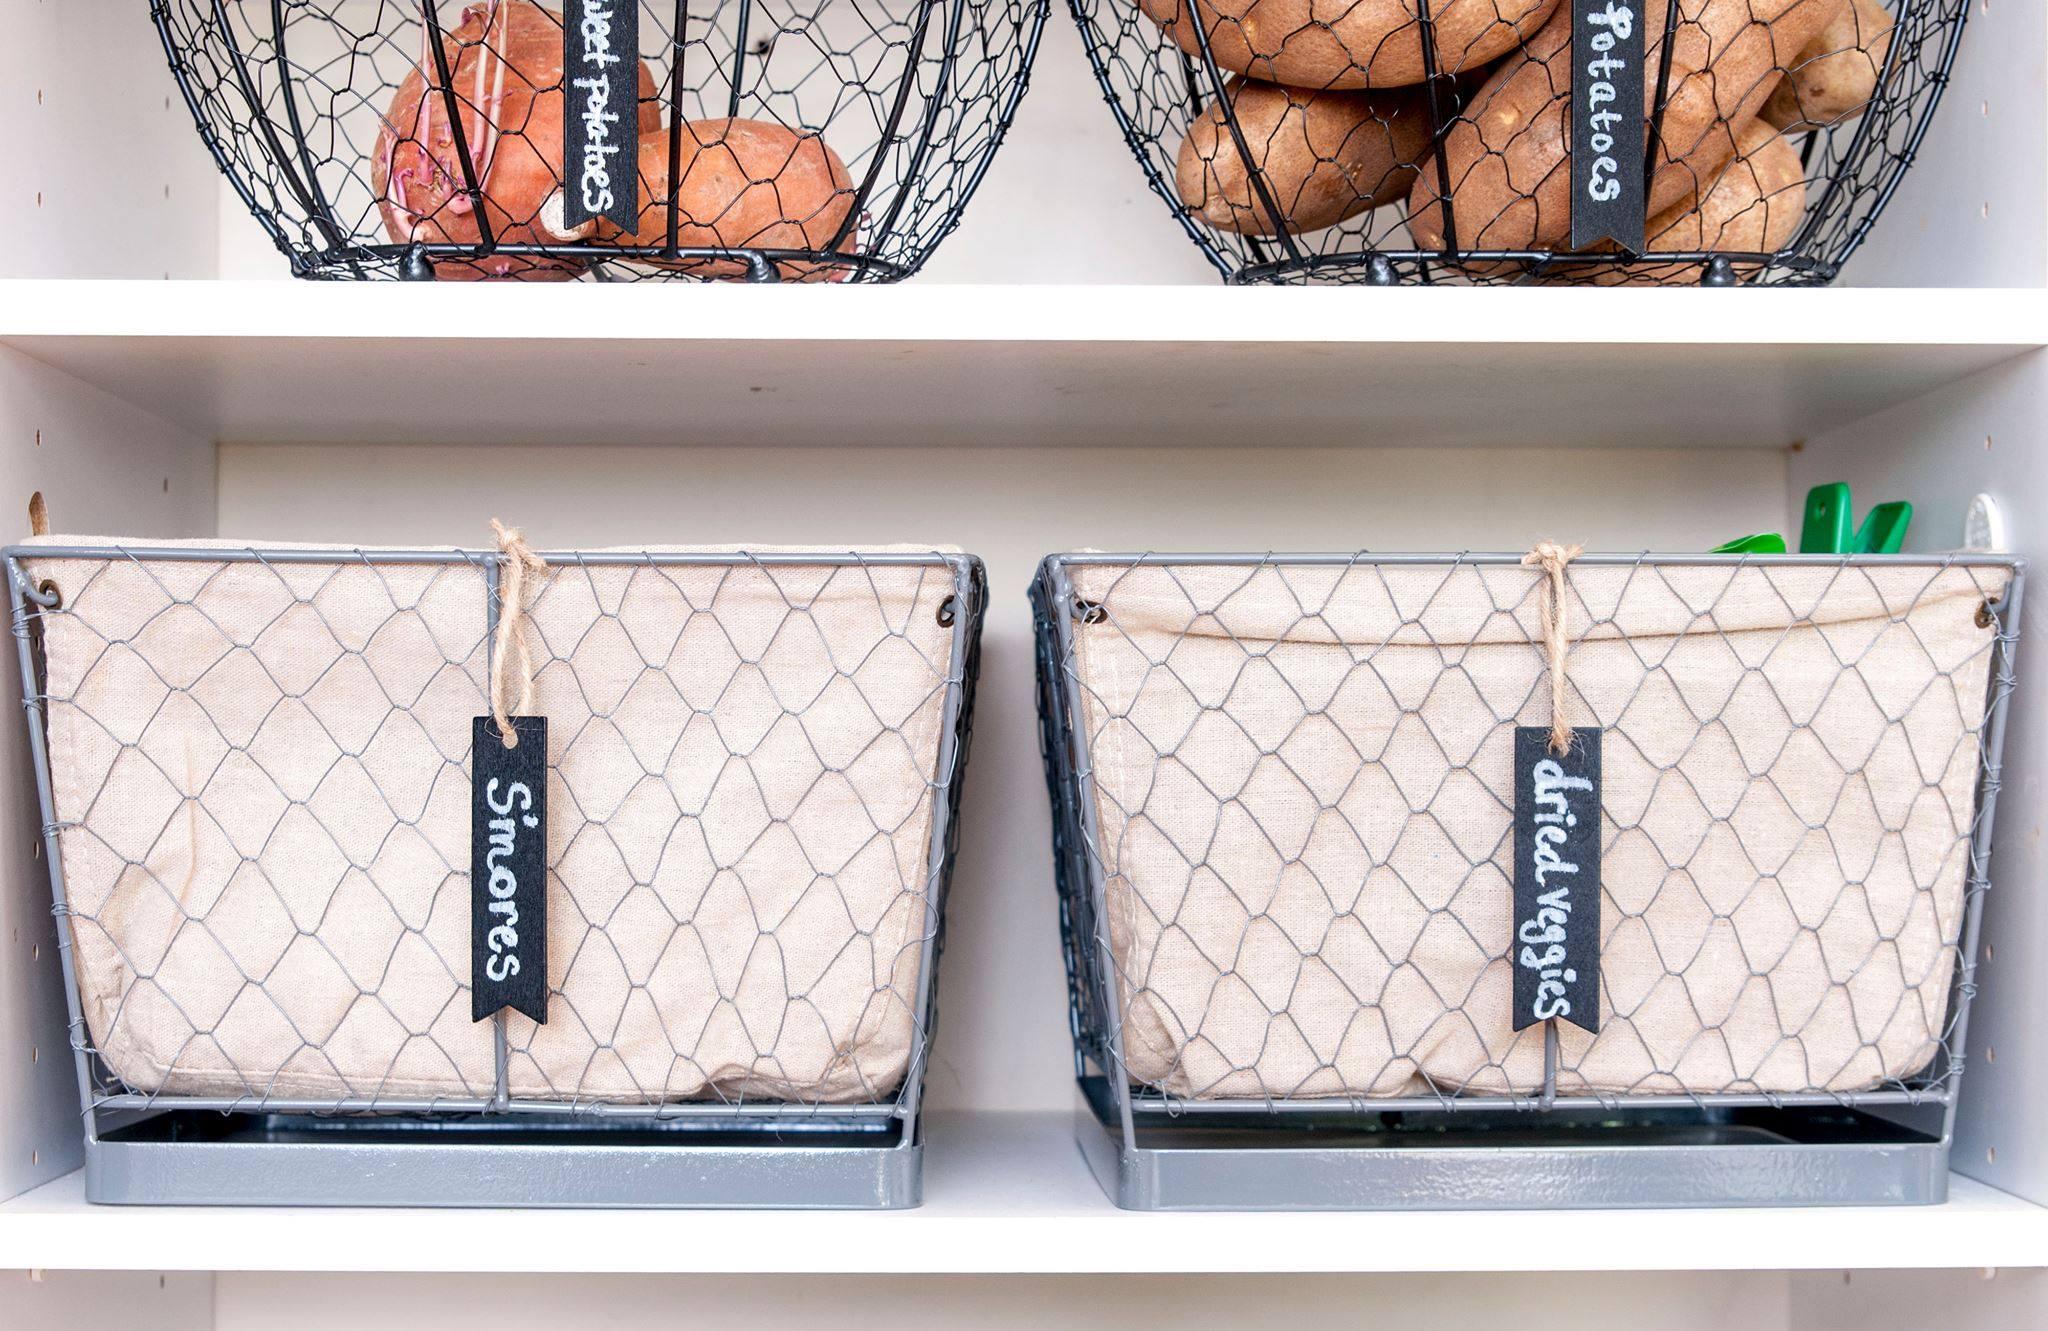 Try labeling a basket or bin for easy identification!